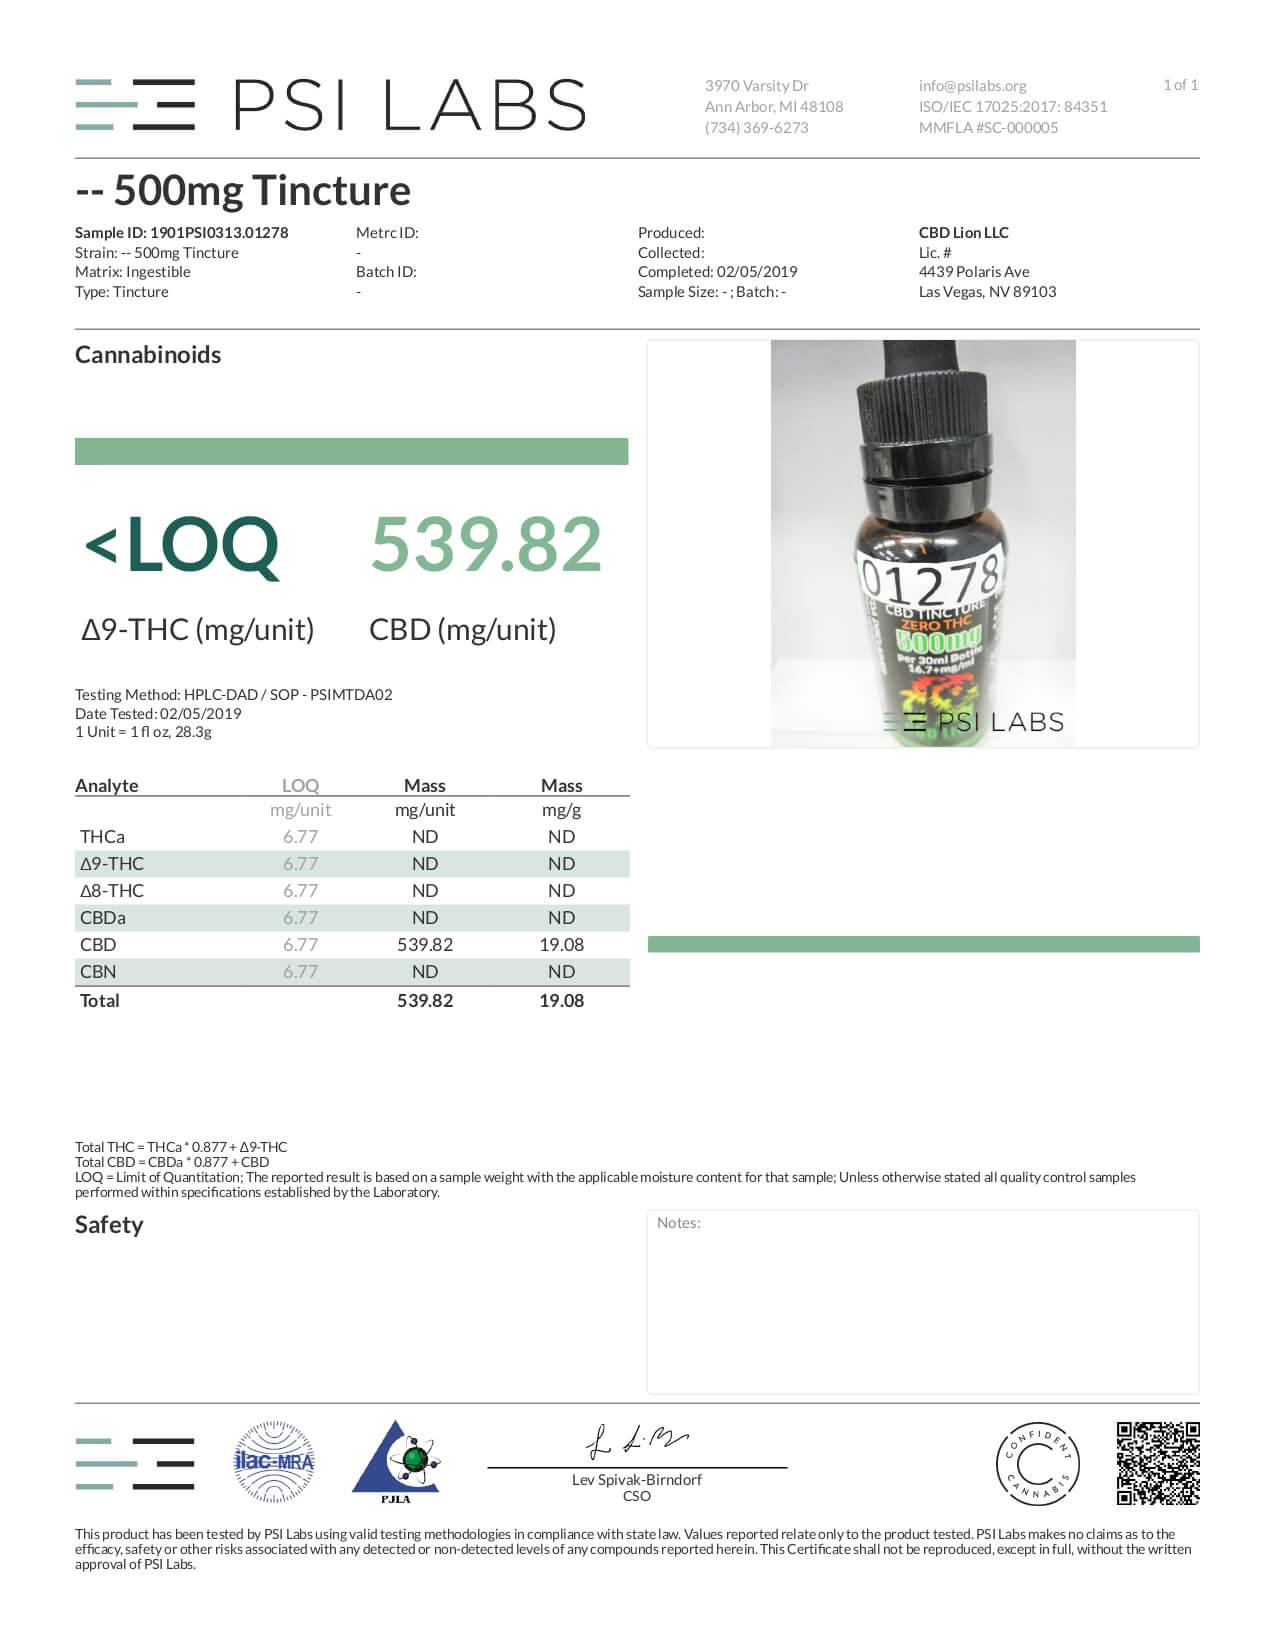 CBD Lion CBD Tincture Oil 500mg Lab Report